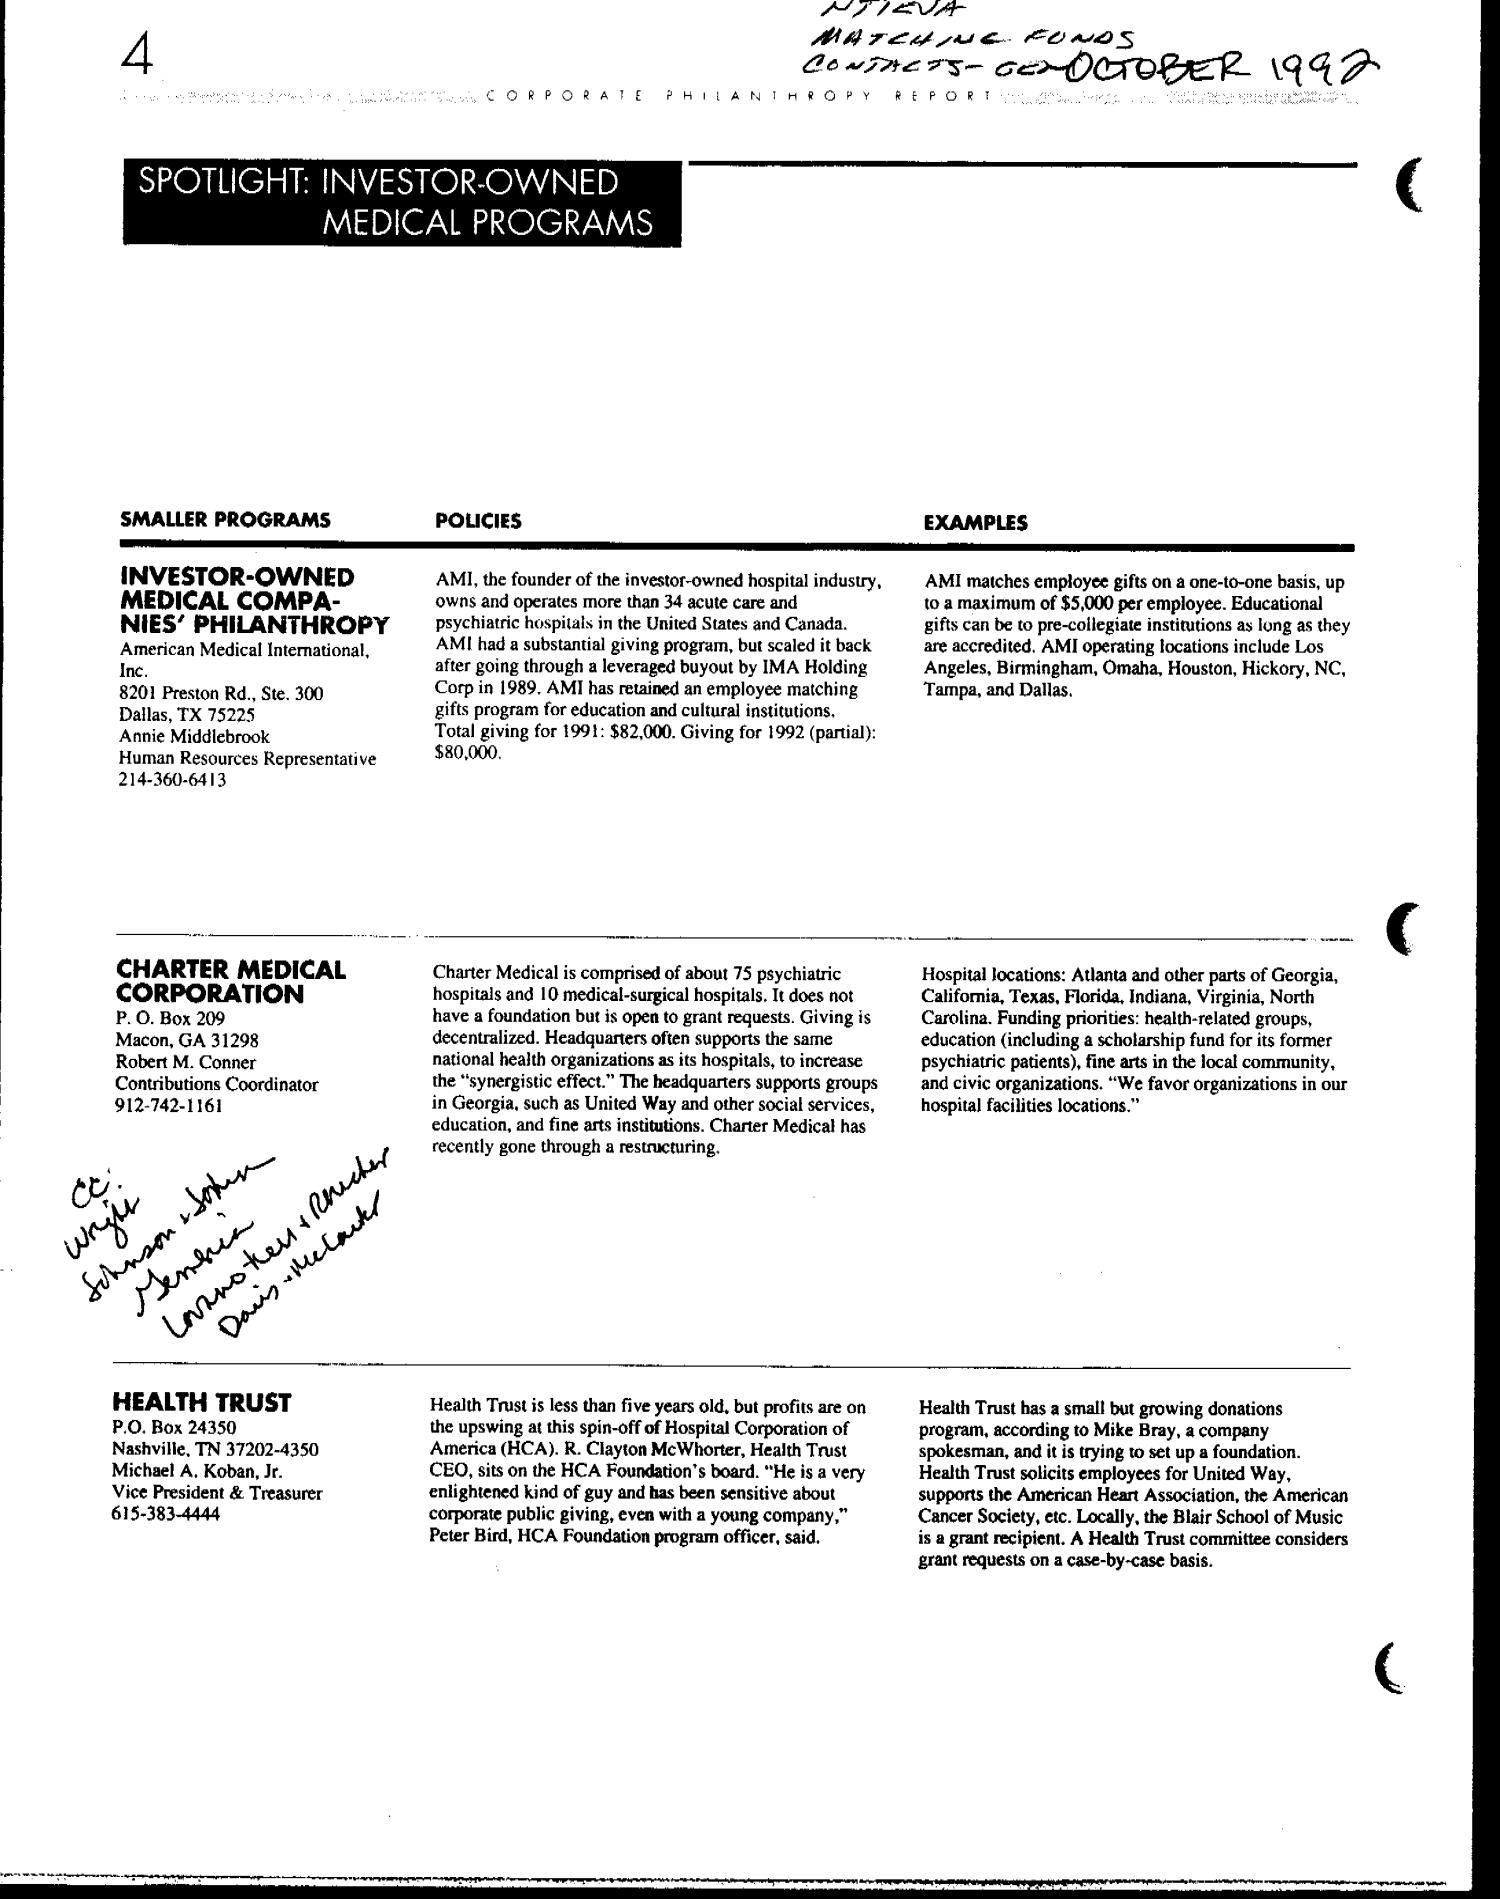 Corporate Philanthropy Report - Digital Library